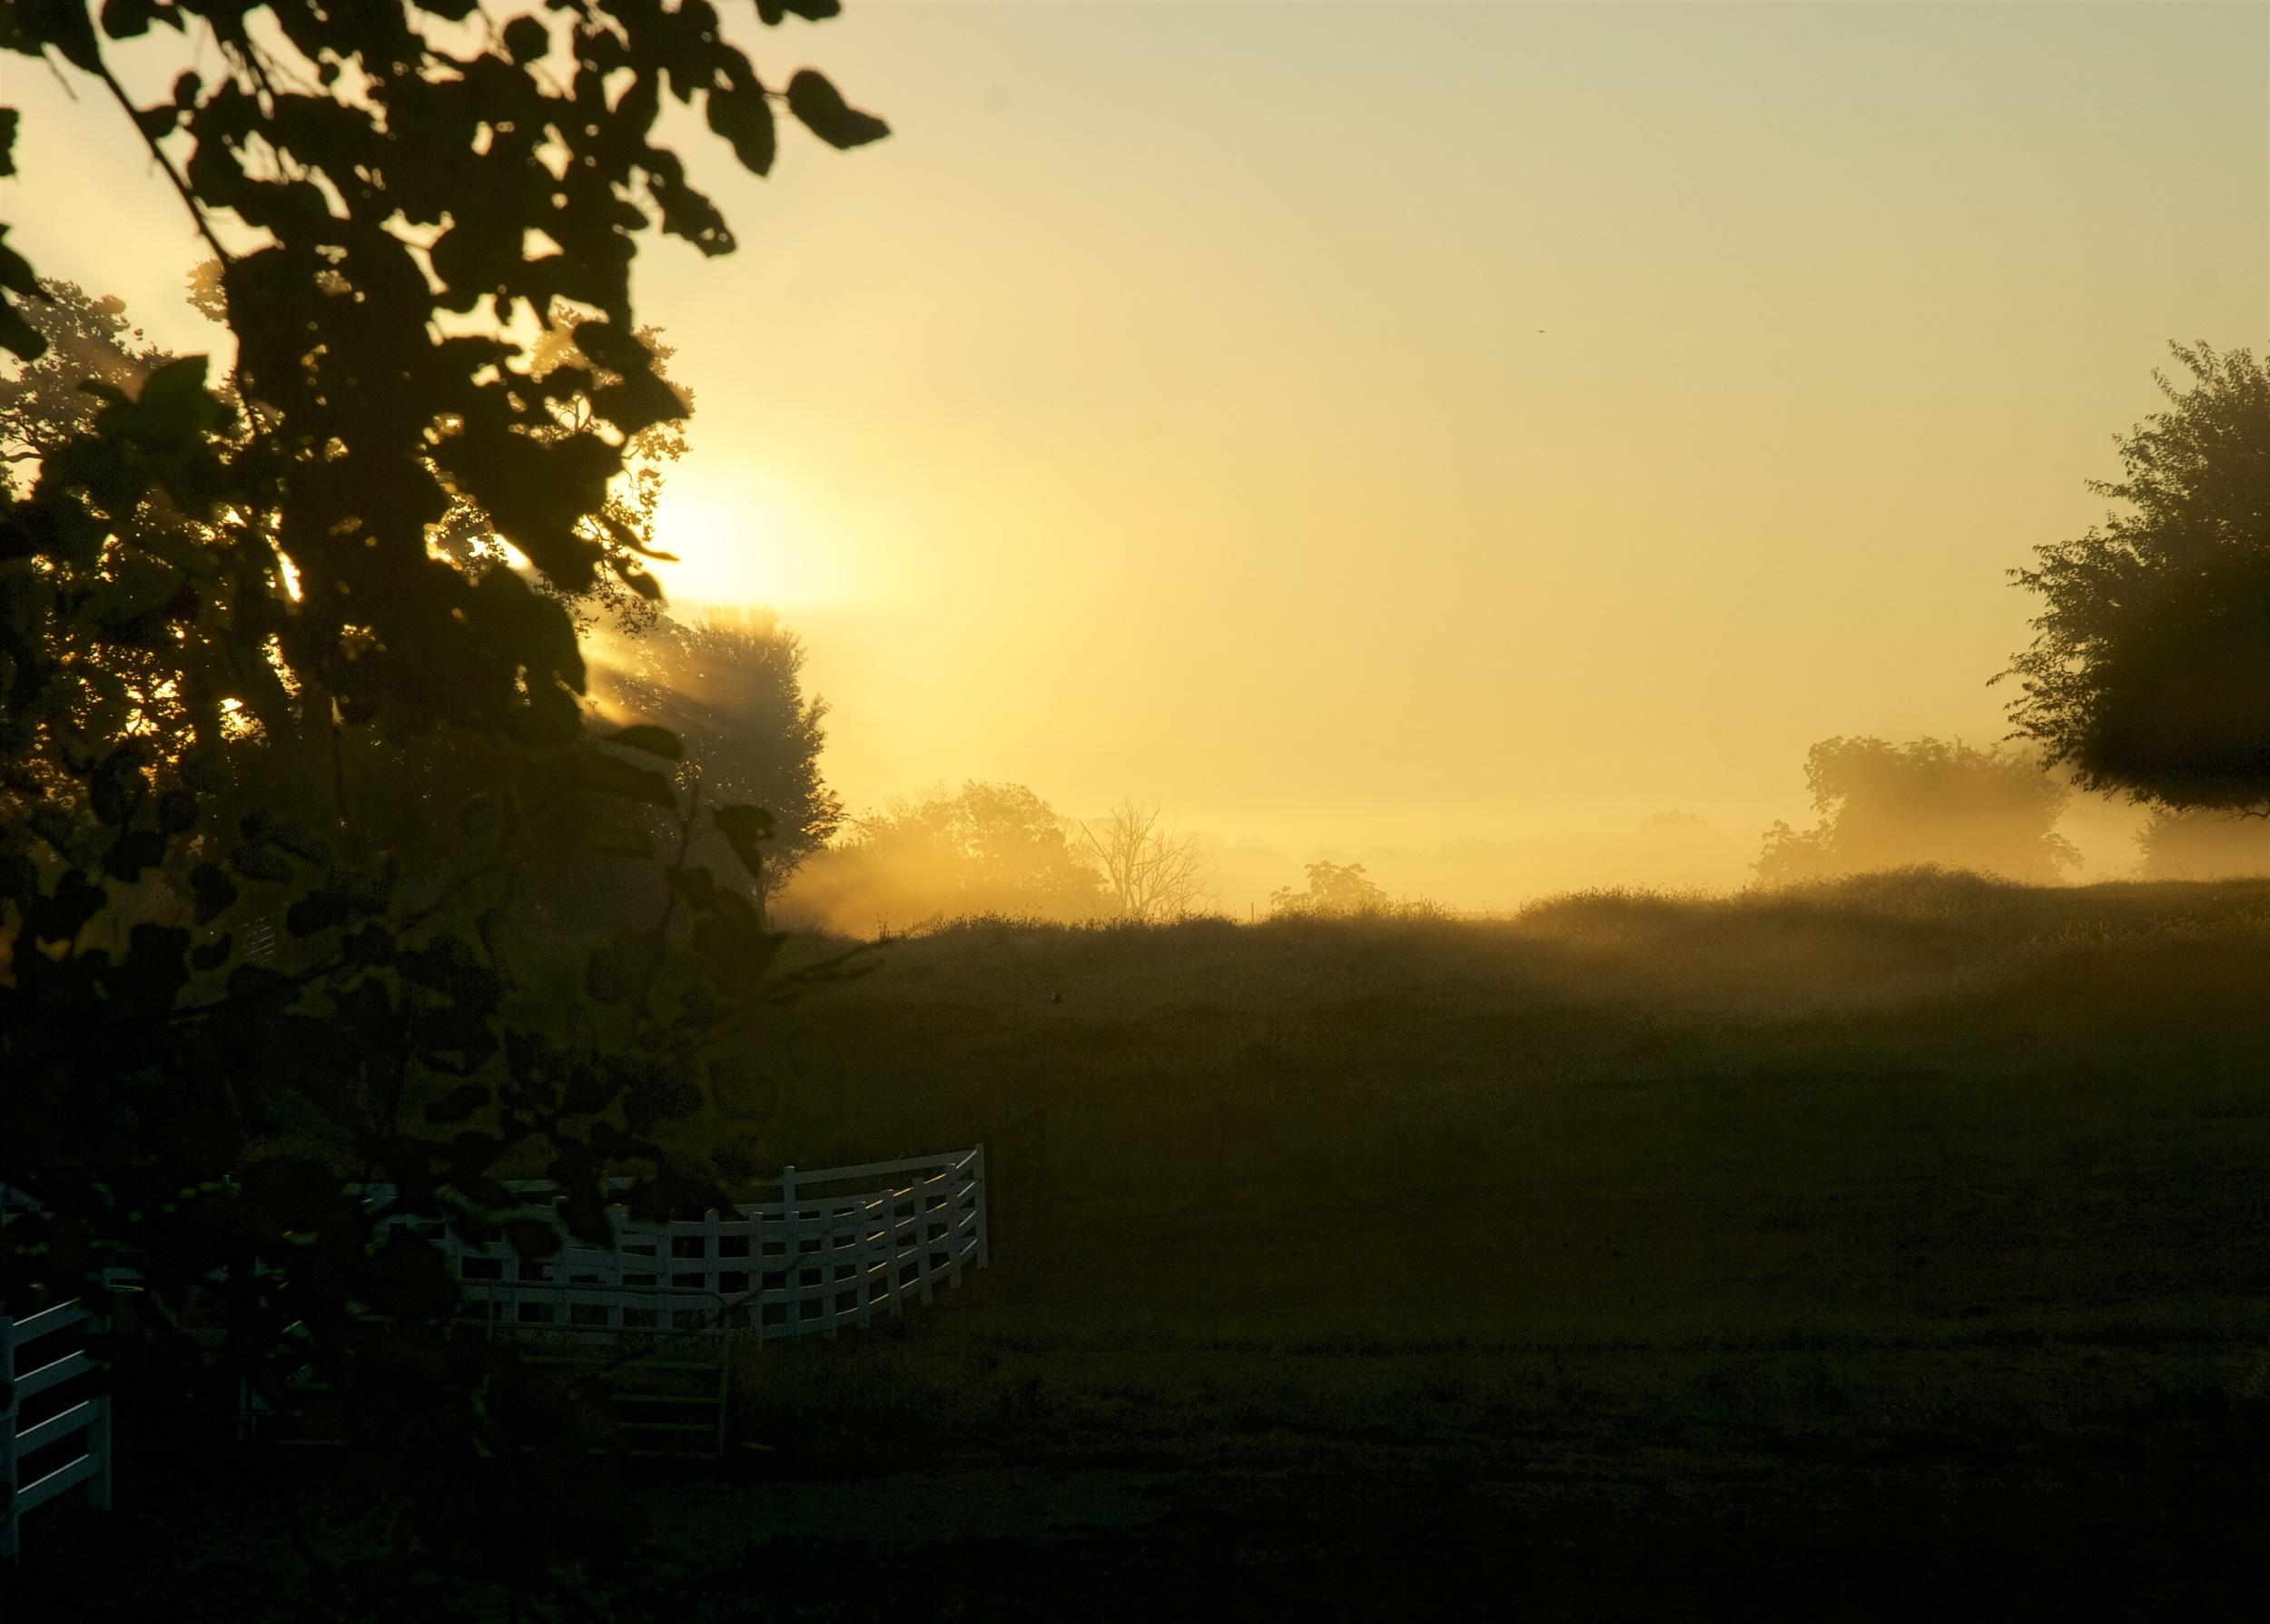 Field Fog, August 2011